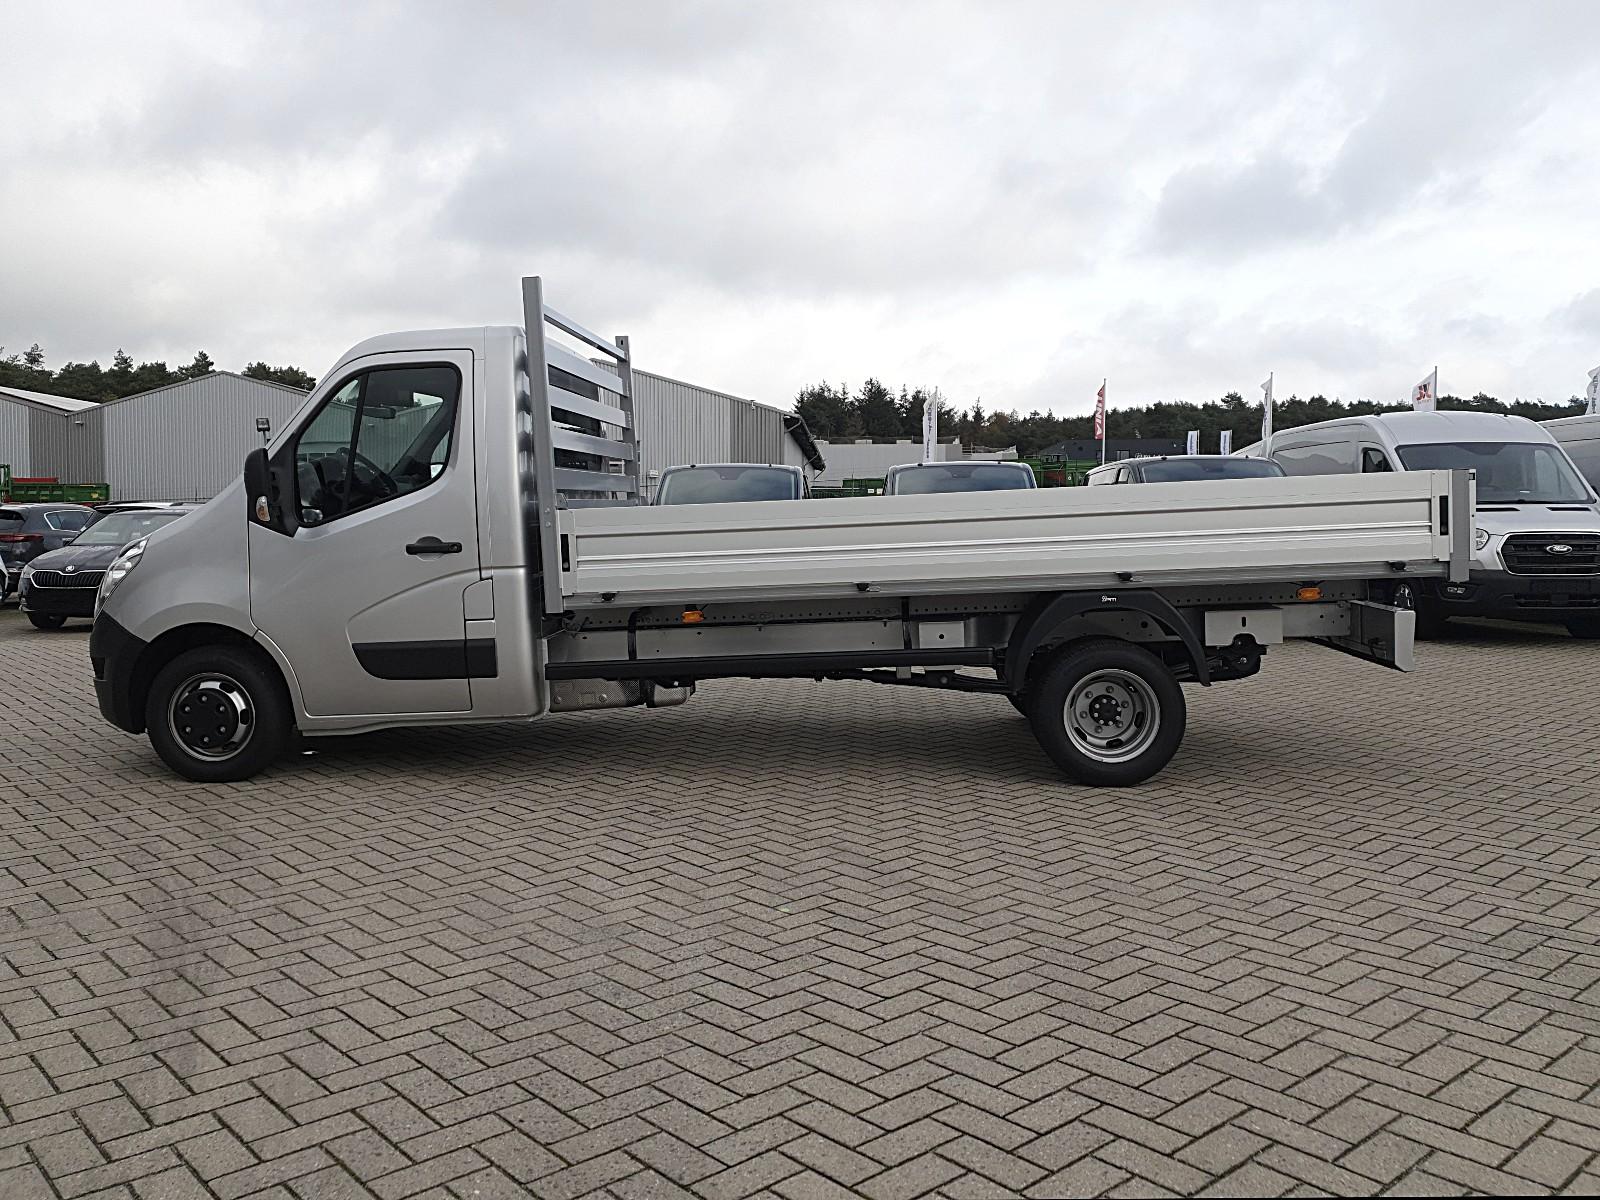 RENAULT MASTER Pritsche 2.3 dCi 163PS L4H1 4,5t 3-Sitzer Klimaautomatik Navi Si Viscaal Fahrzeuggrosshandel GmbH, D-49847 Itterbeck